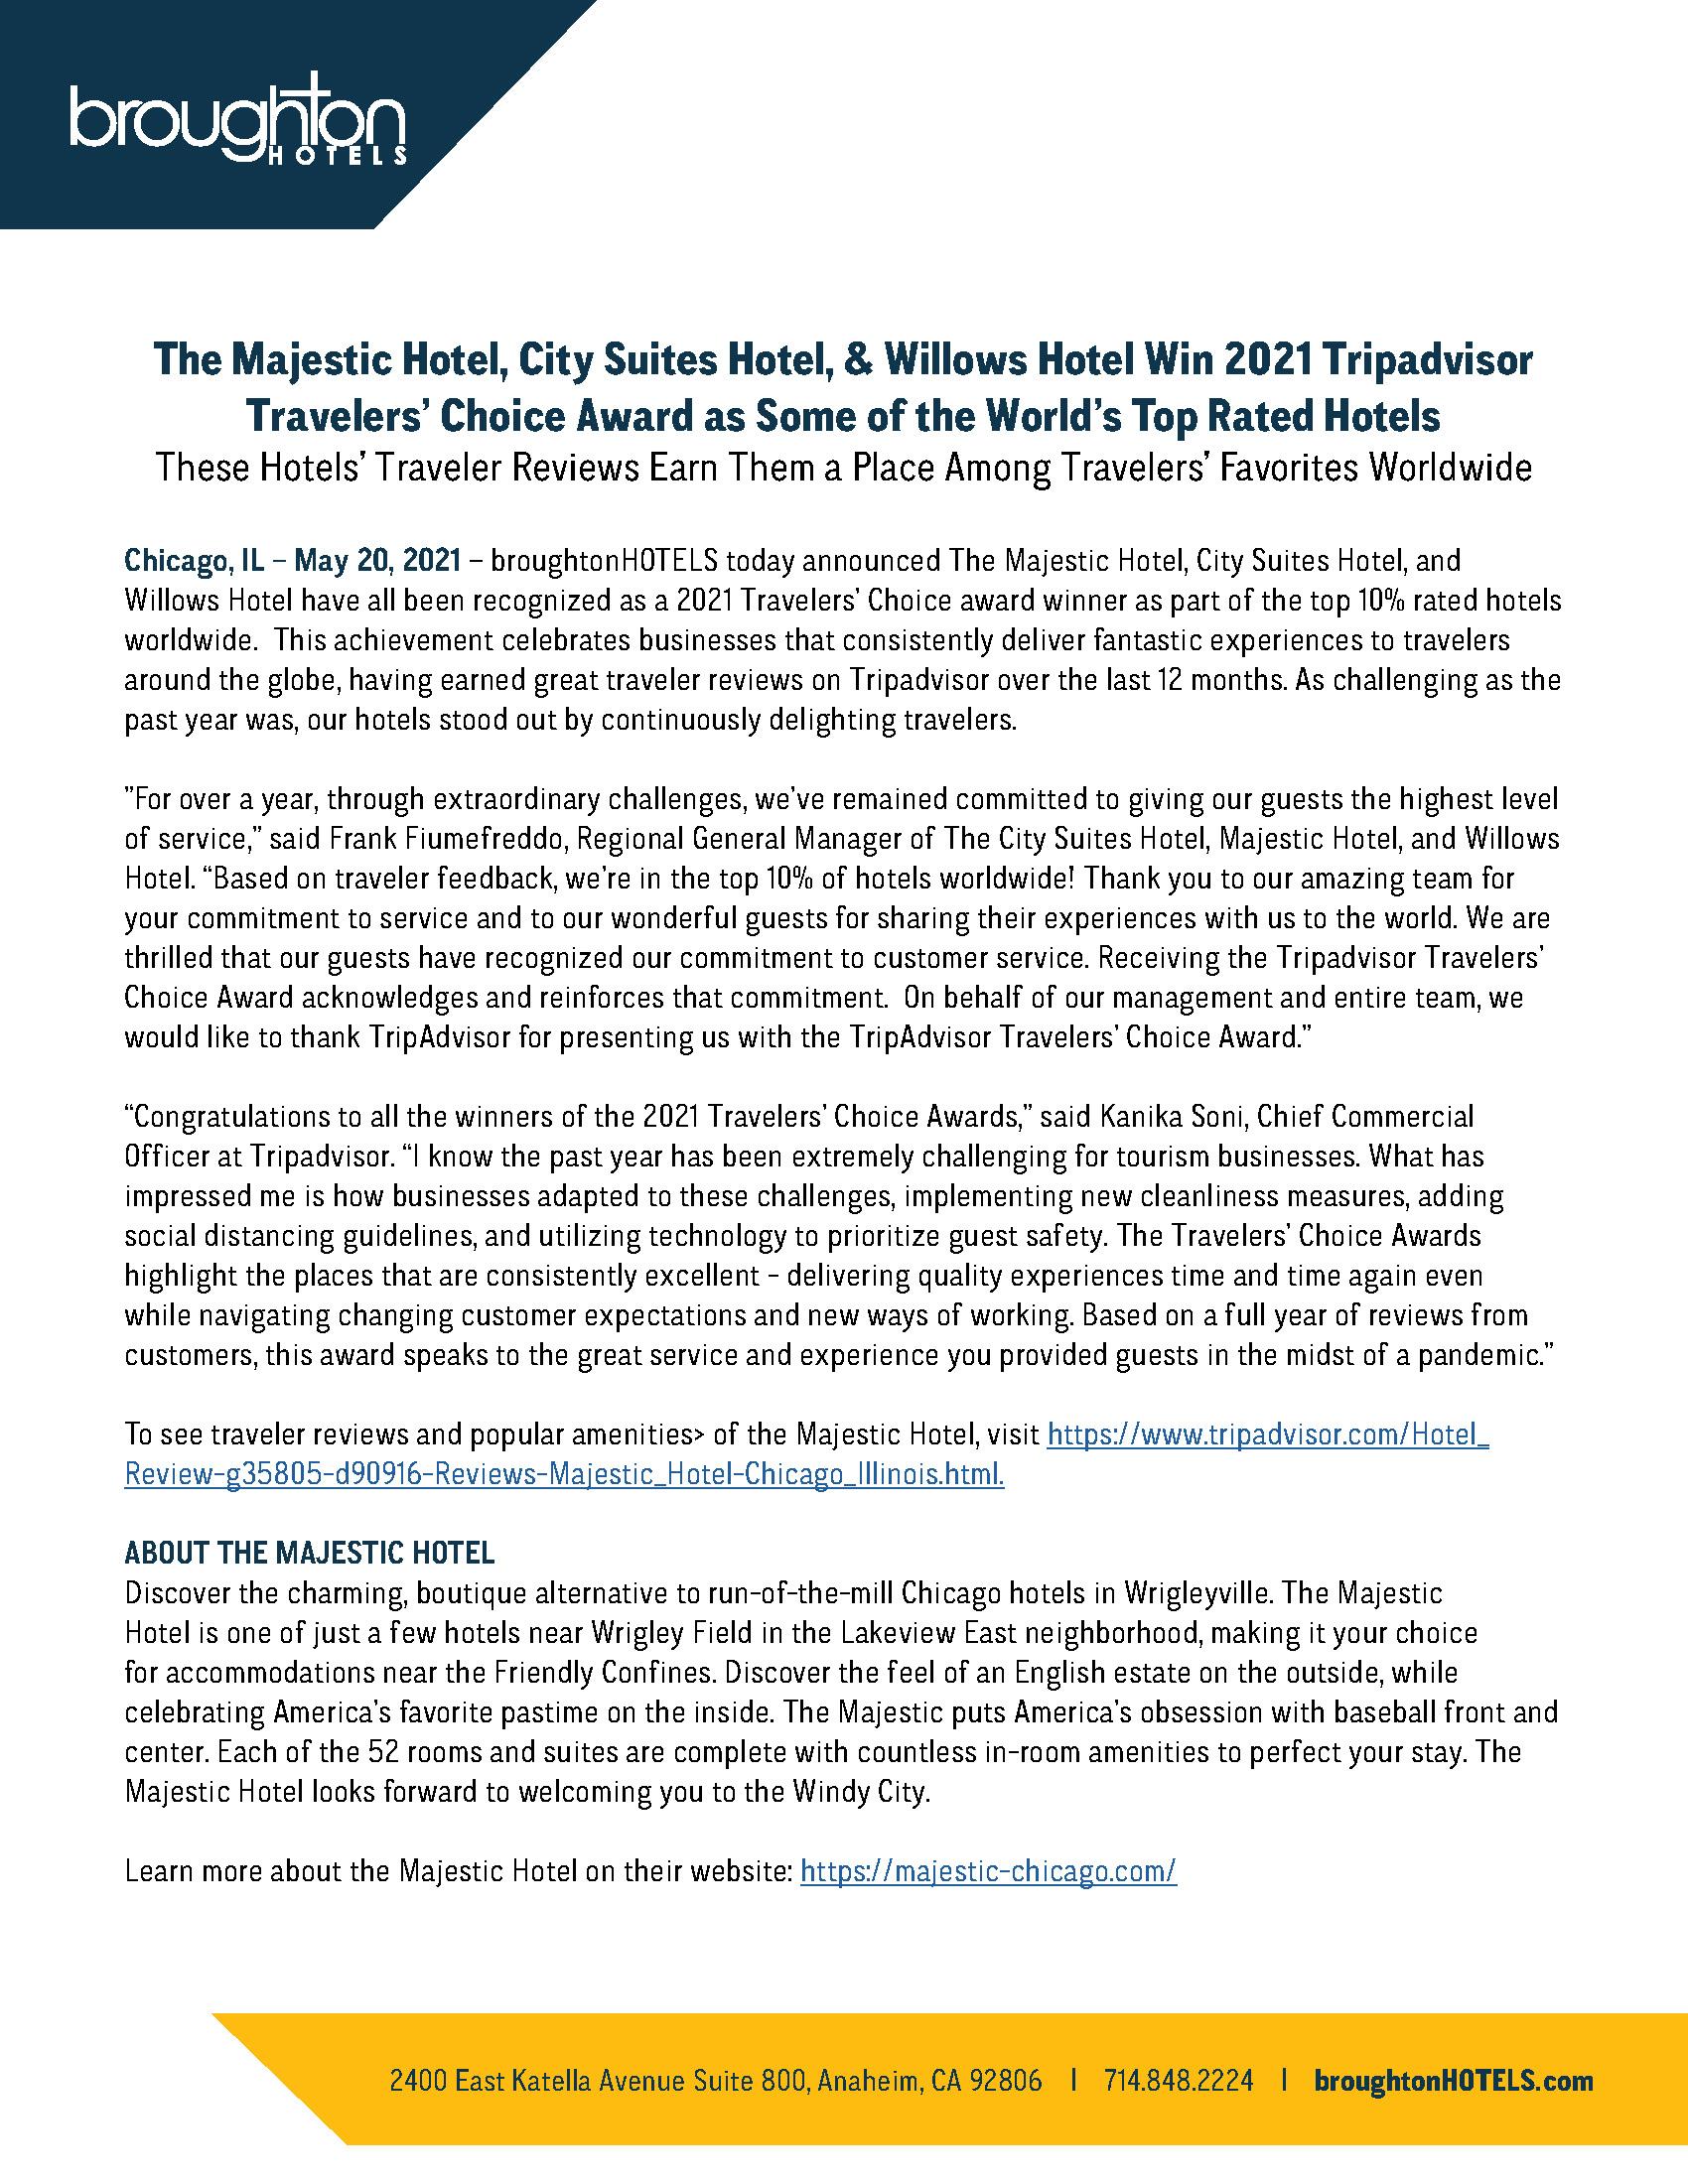 2021 Tripadvisors Travelers' Choice Award for Northside Chicago Hotels